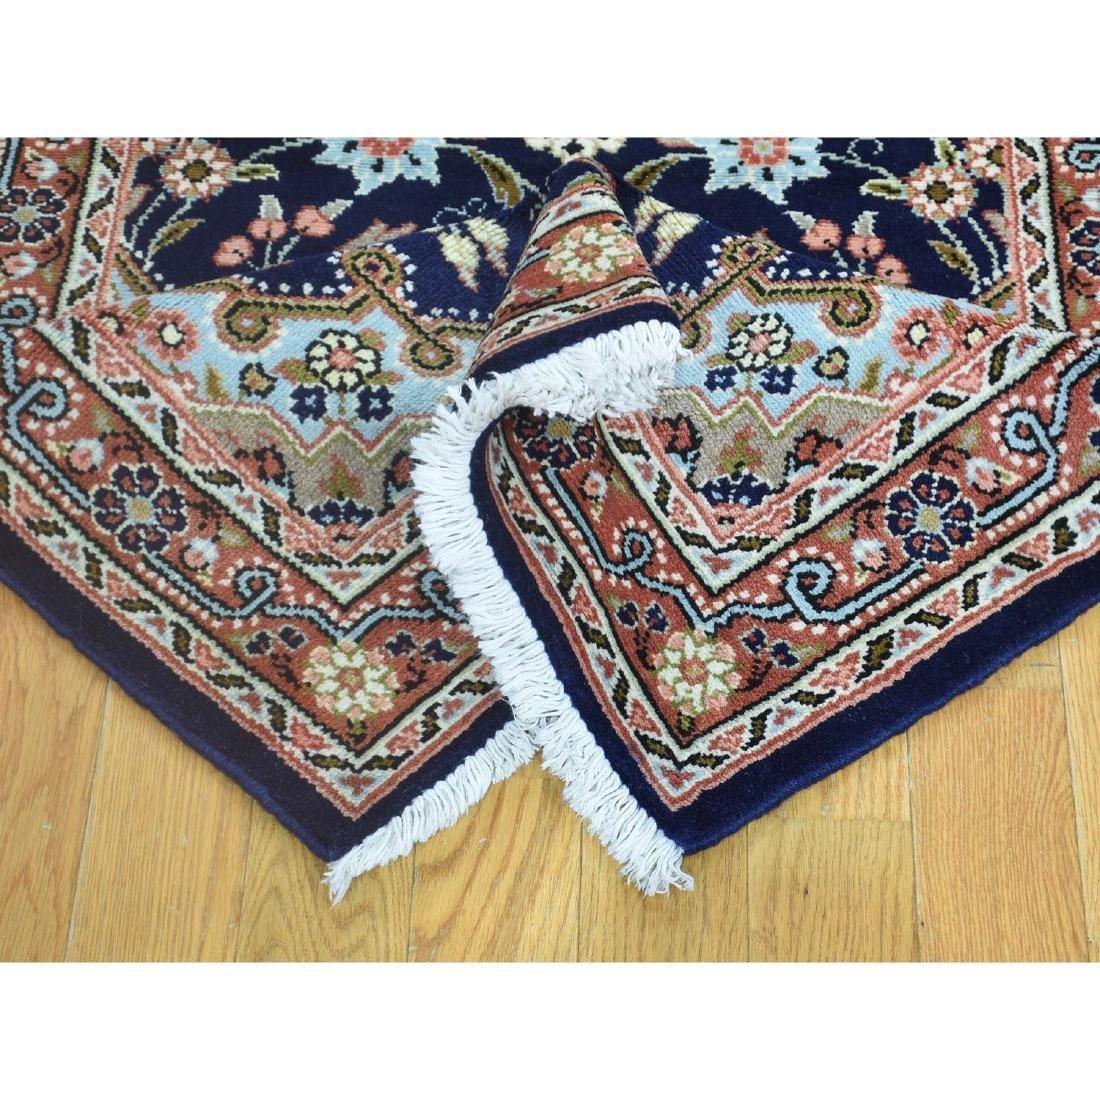 Handmade Persian Hamadan Runner Oriental Rug 2.8x10.2 - 7